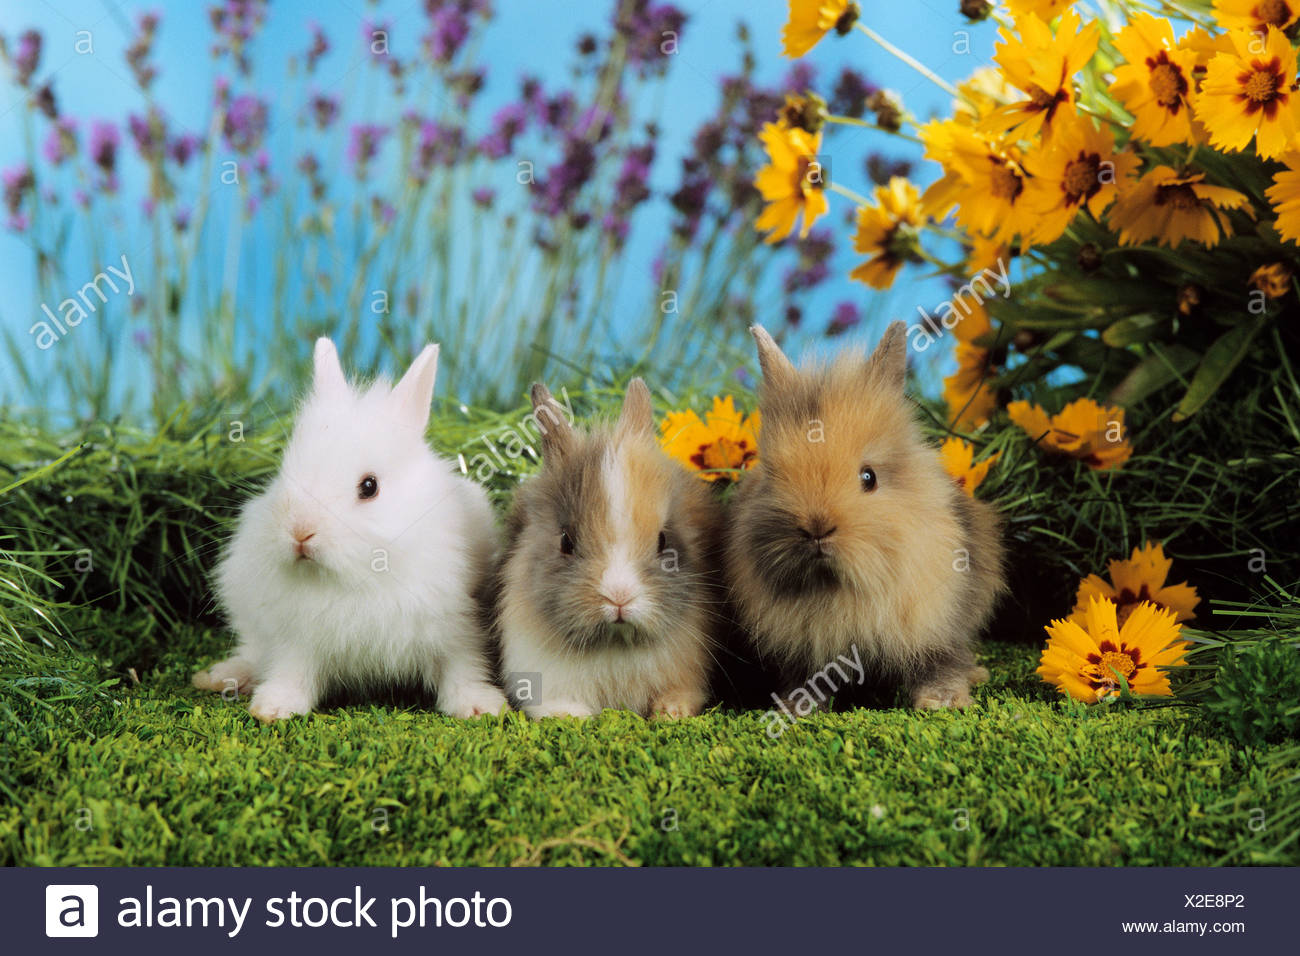 three young pygmy rabbits besides flowers / Sylilagus idahoensis / Brachylagus idahoensis - Stock Image